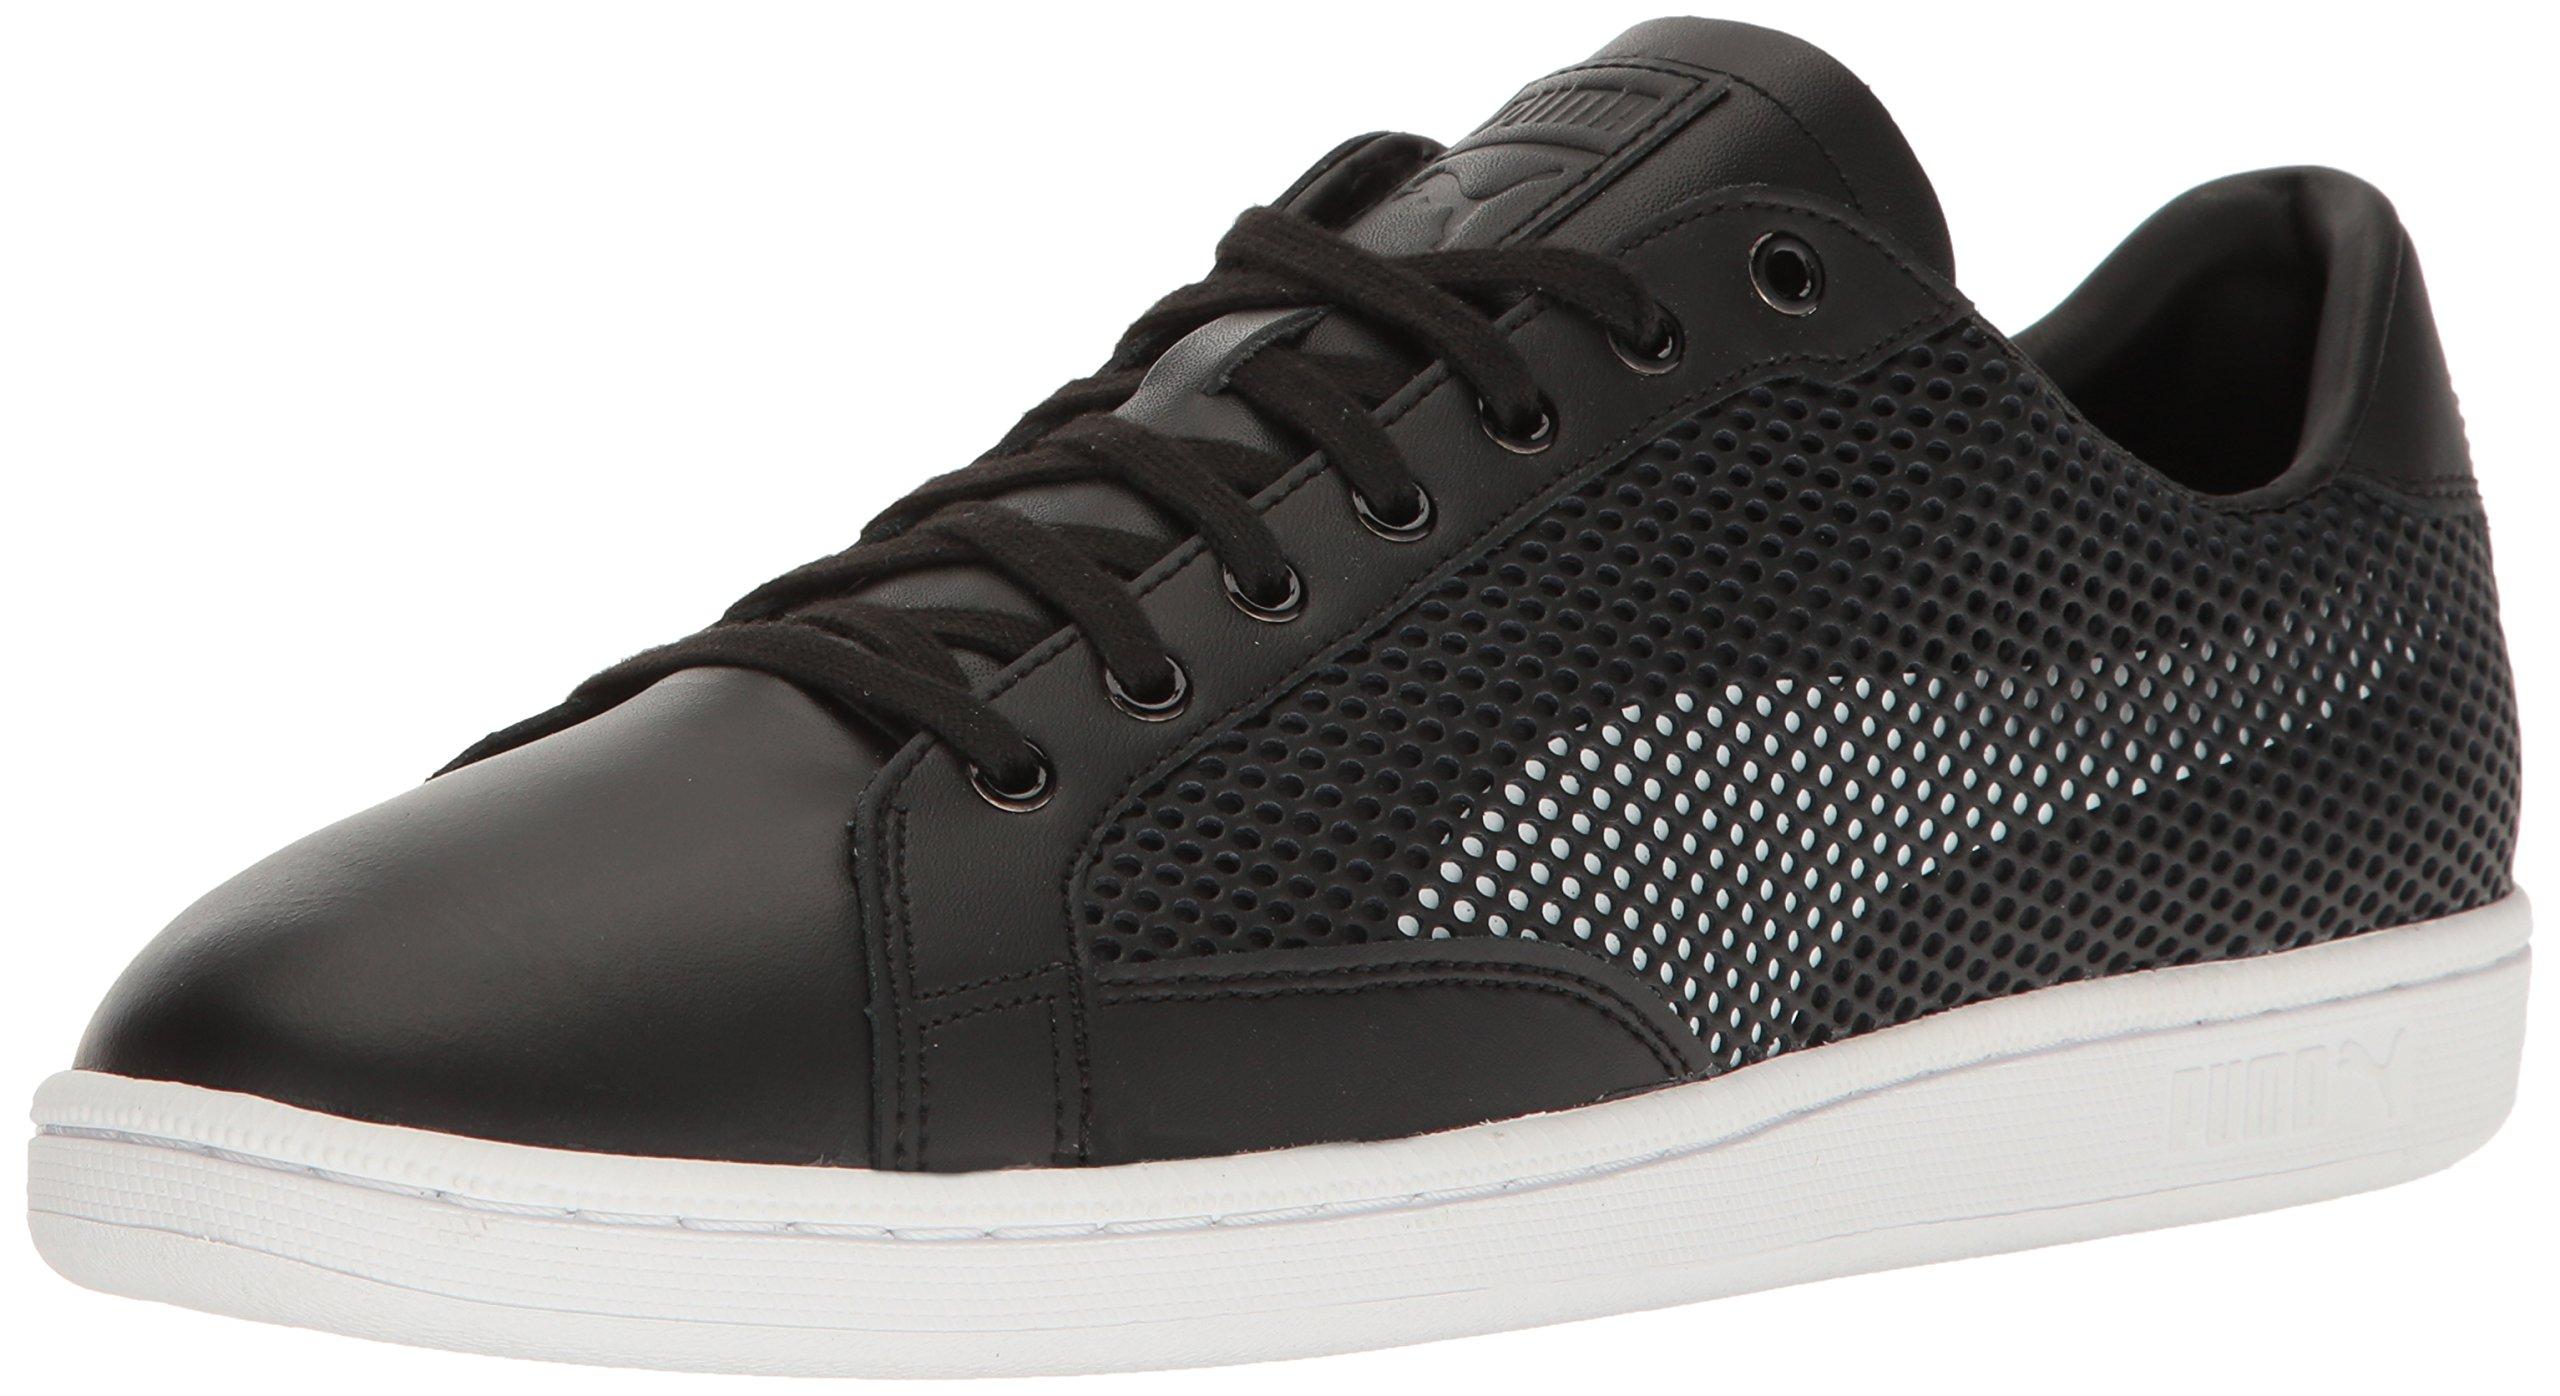 PUMA Men's Match 74 Summer Shade Fashion Sneaker, Black Whit, 9.5 M US